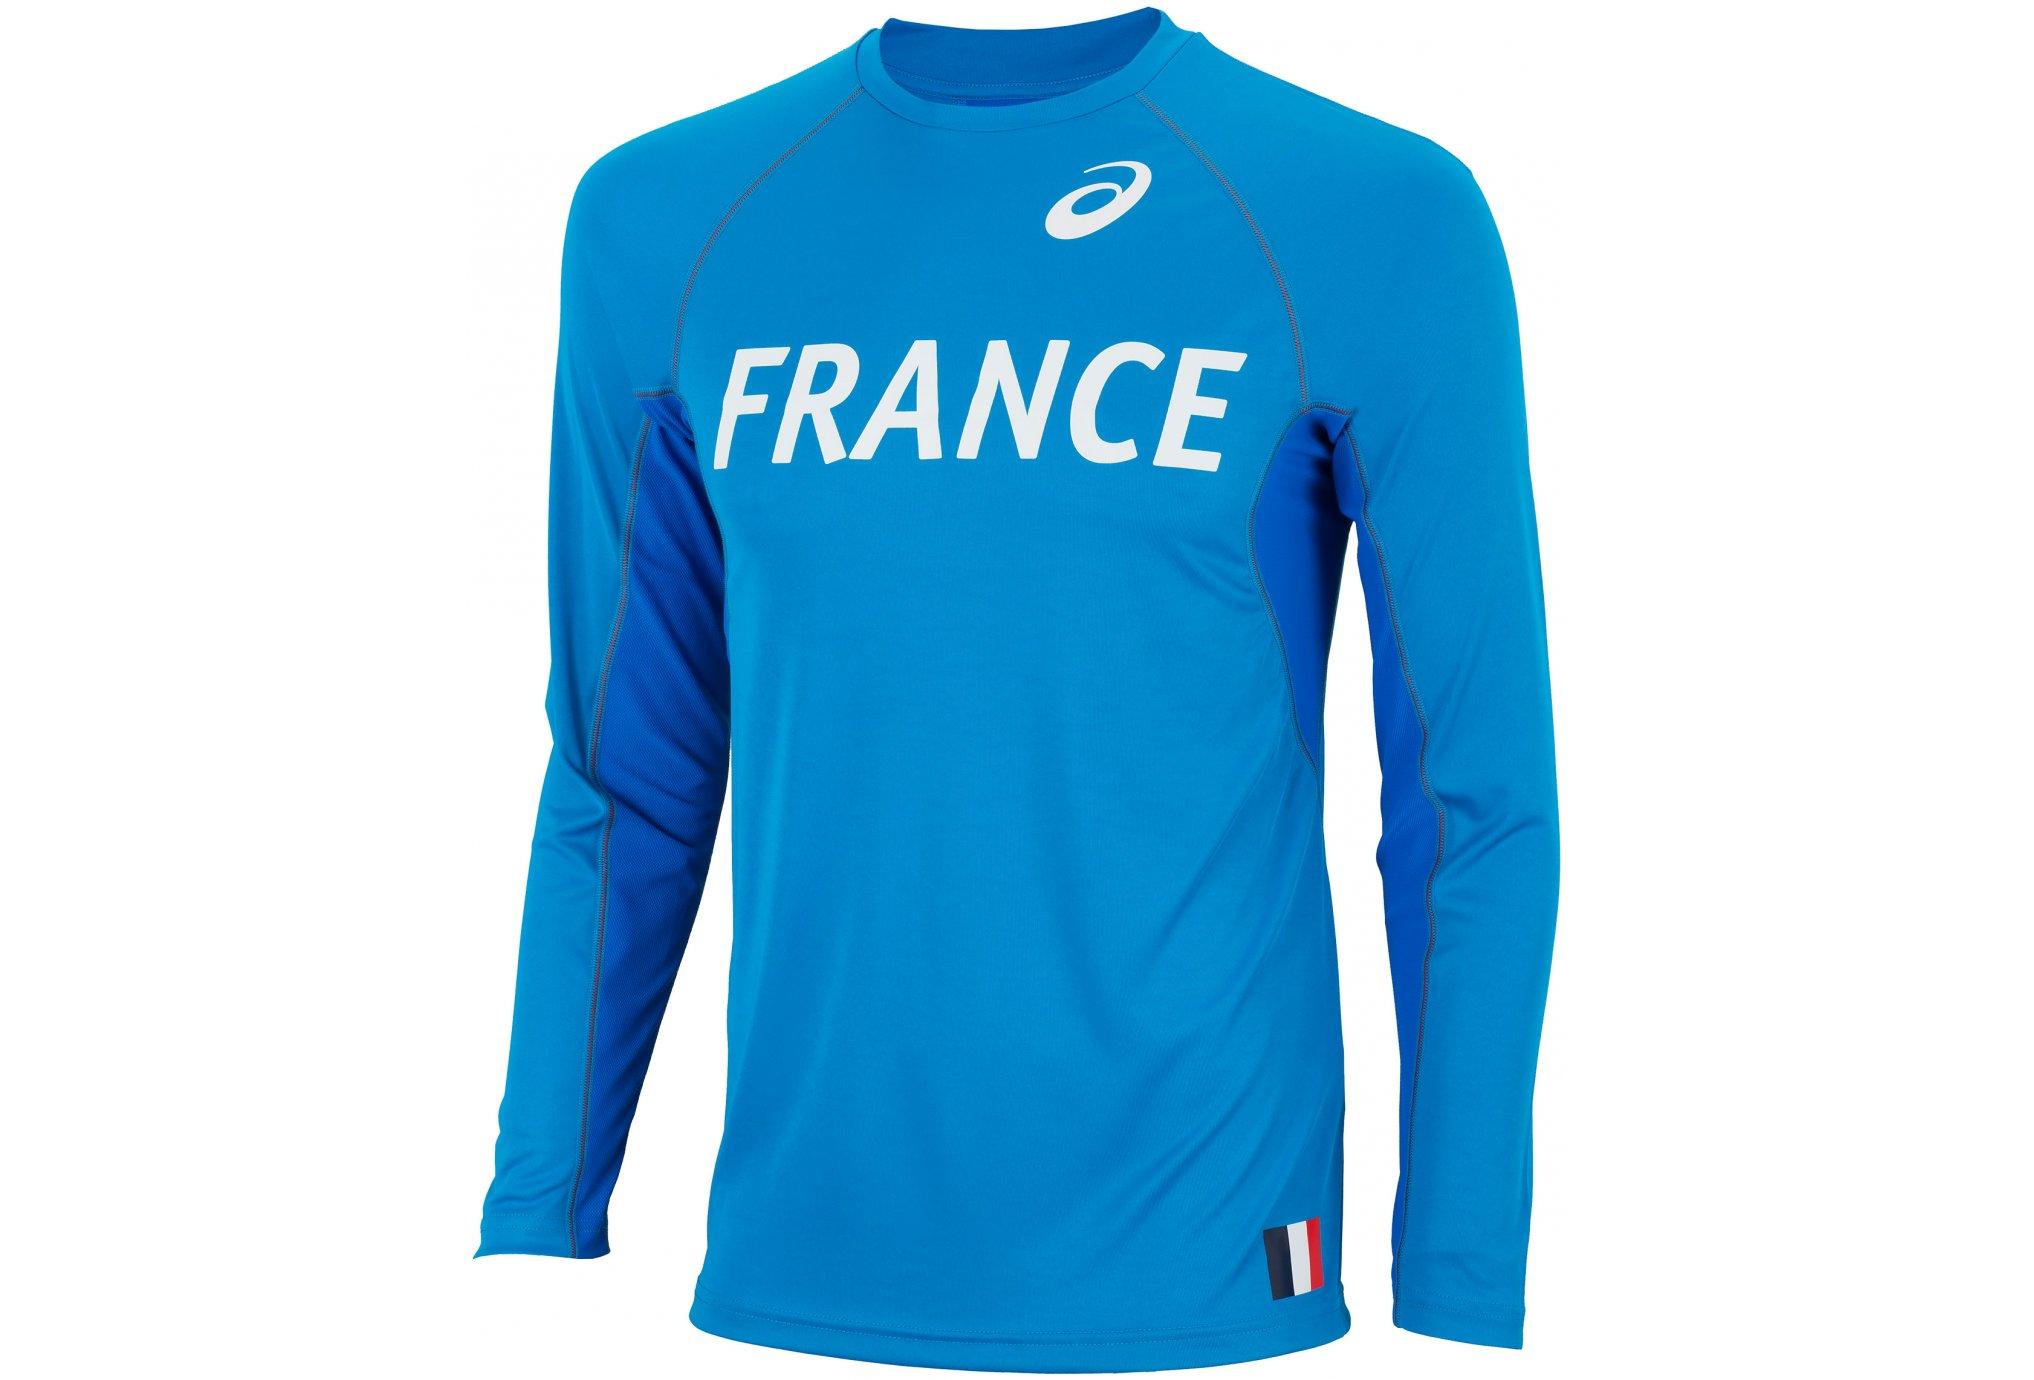 Asics Maillot Equipe de France M vêtement running homme